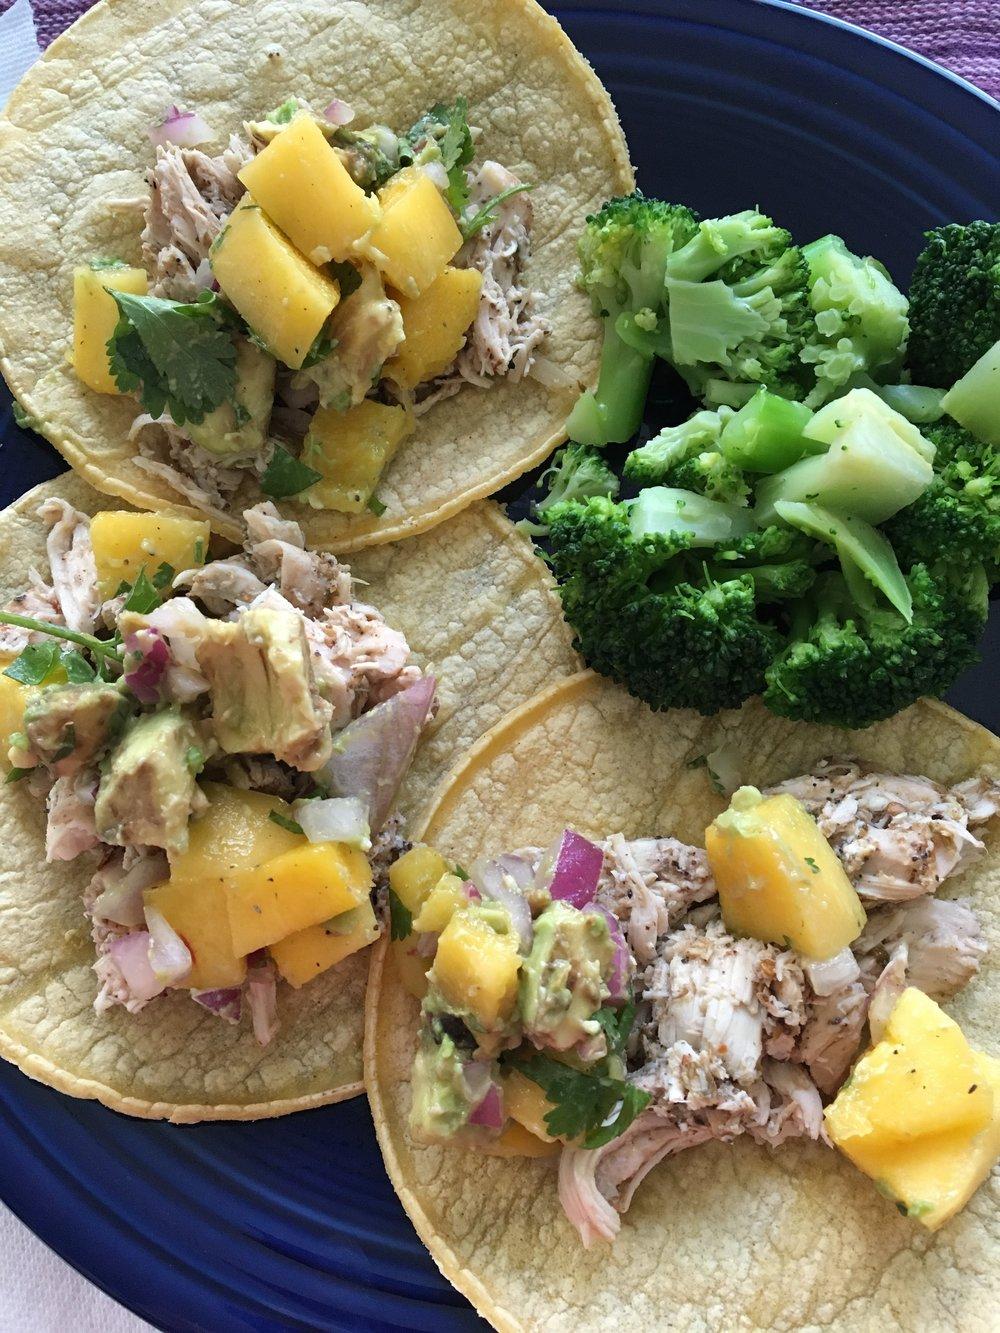 Crockpot jerk chicken tacos with mango salsa